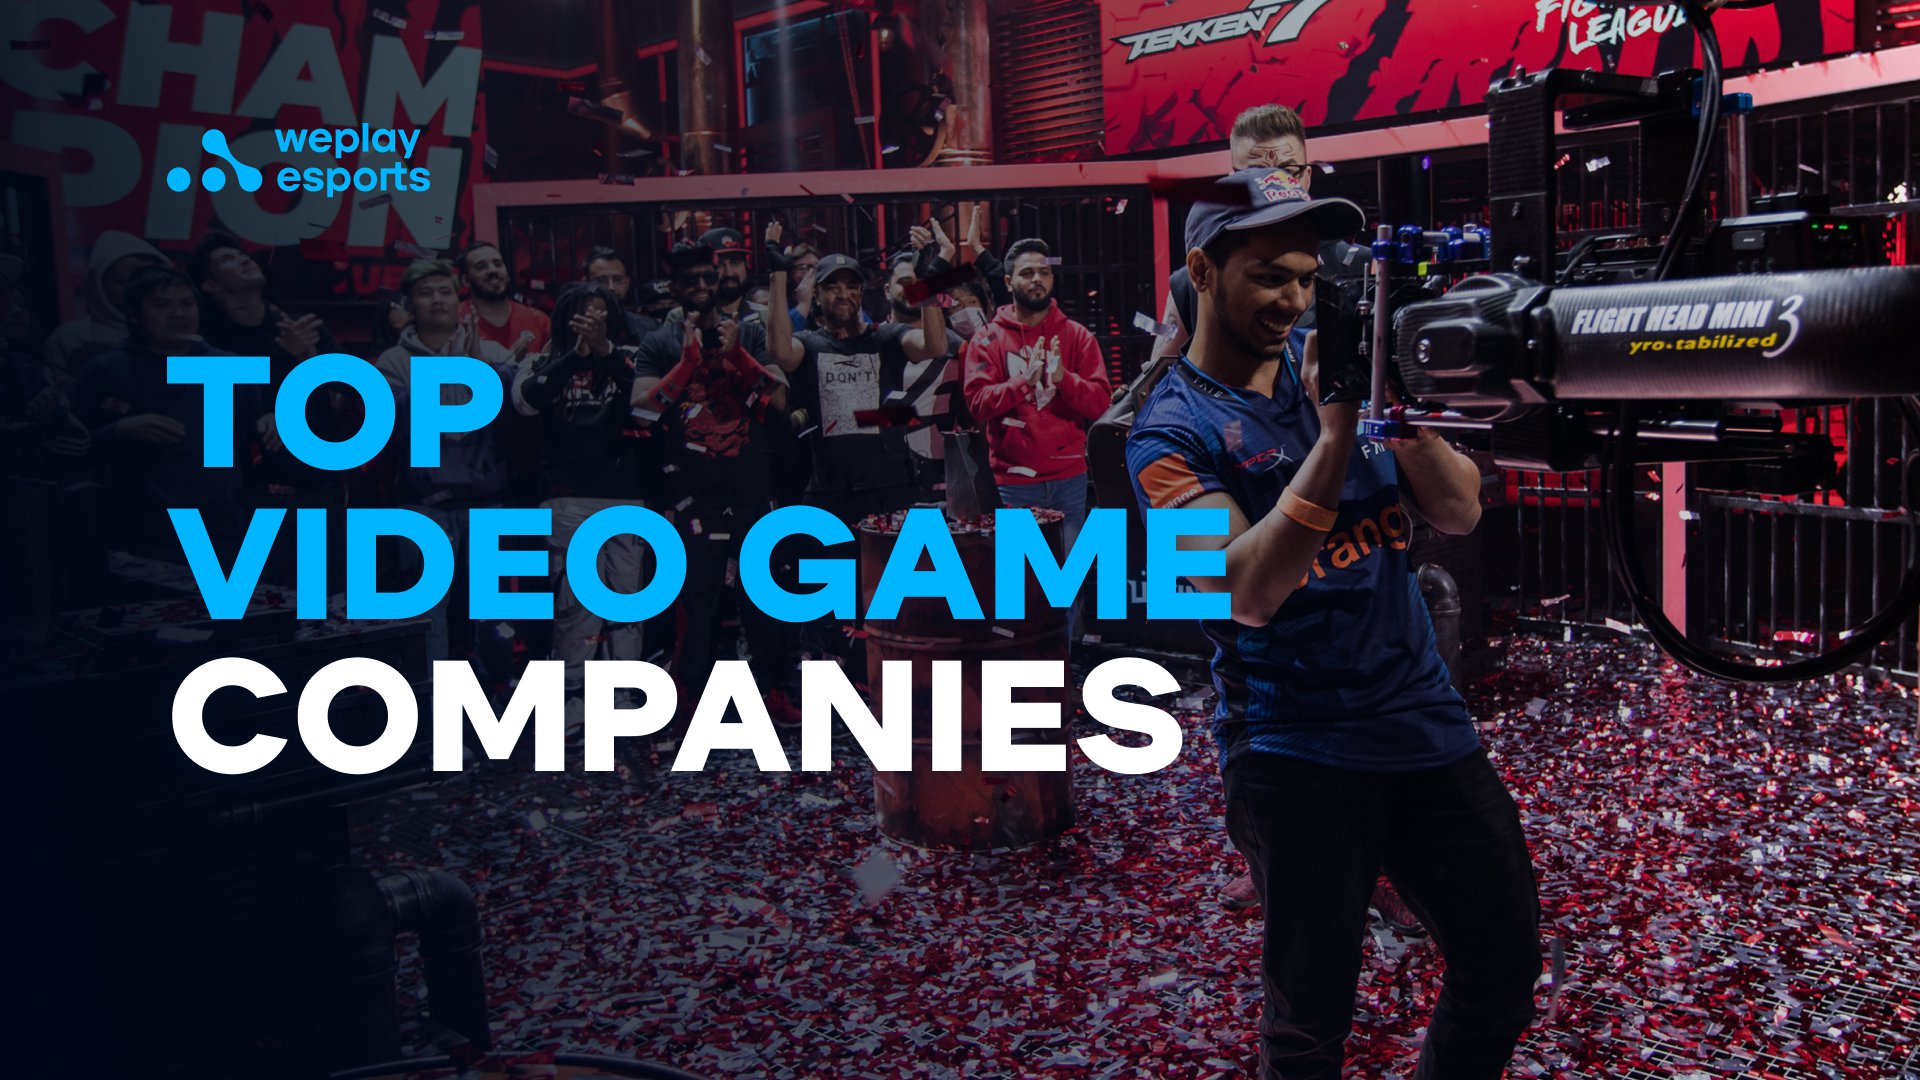 Top Video Games Companies